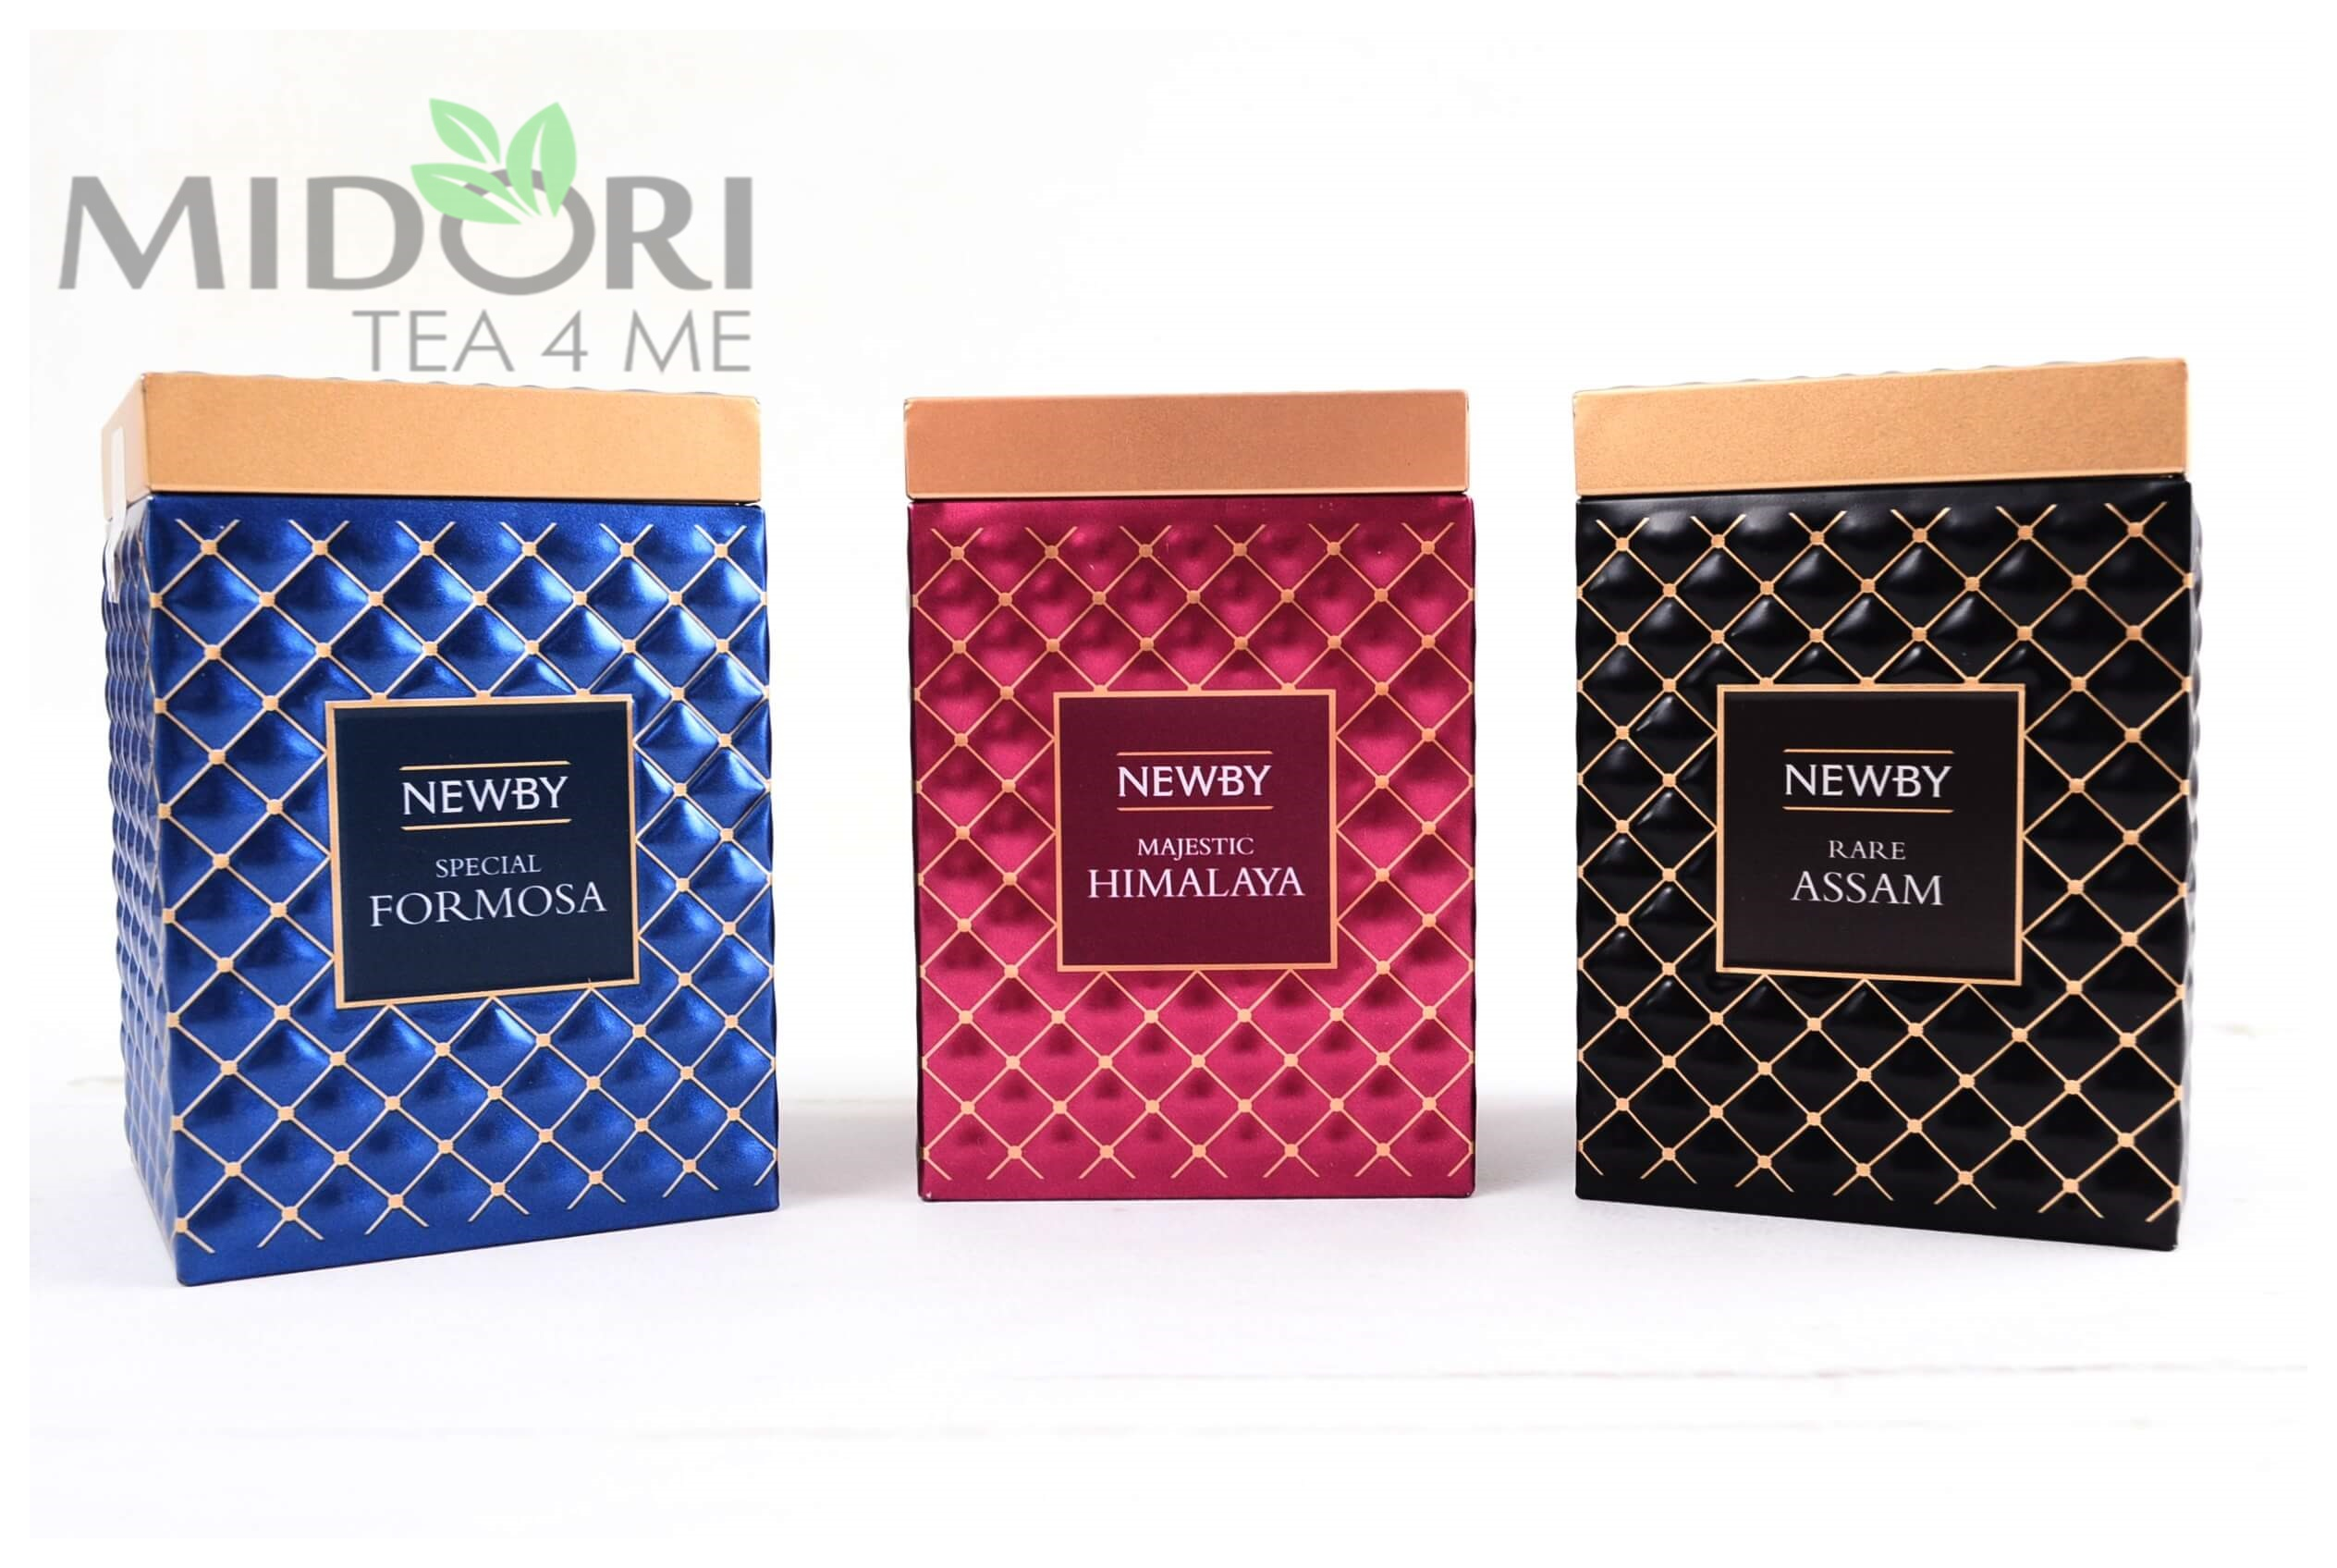 special formosa, zielona herbata tajwańska